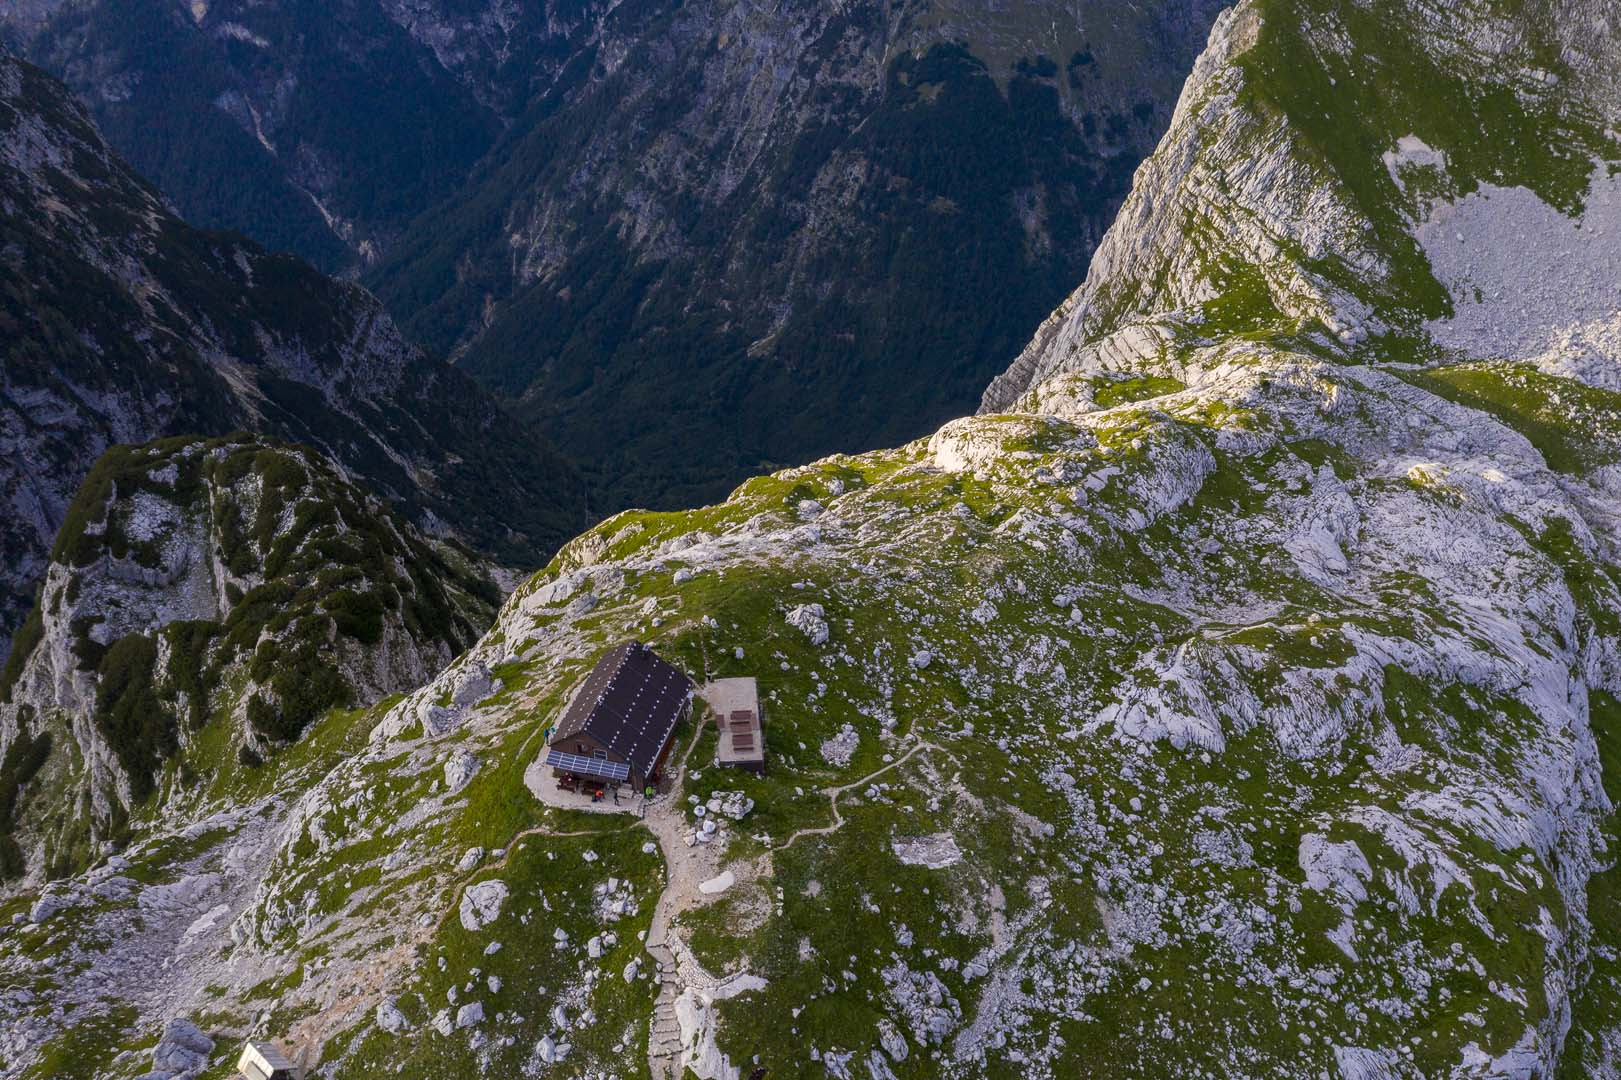 Slovenie 201907 253 HR © Peter Trimbos